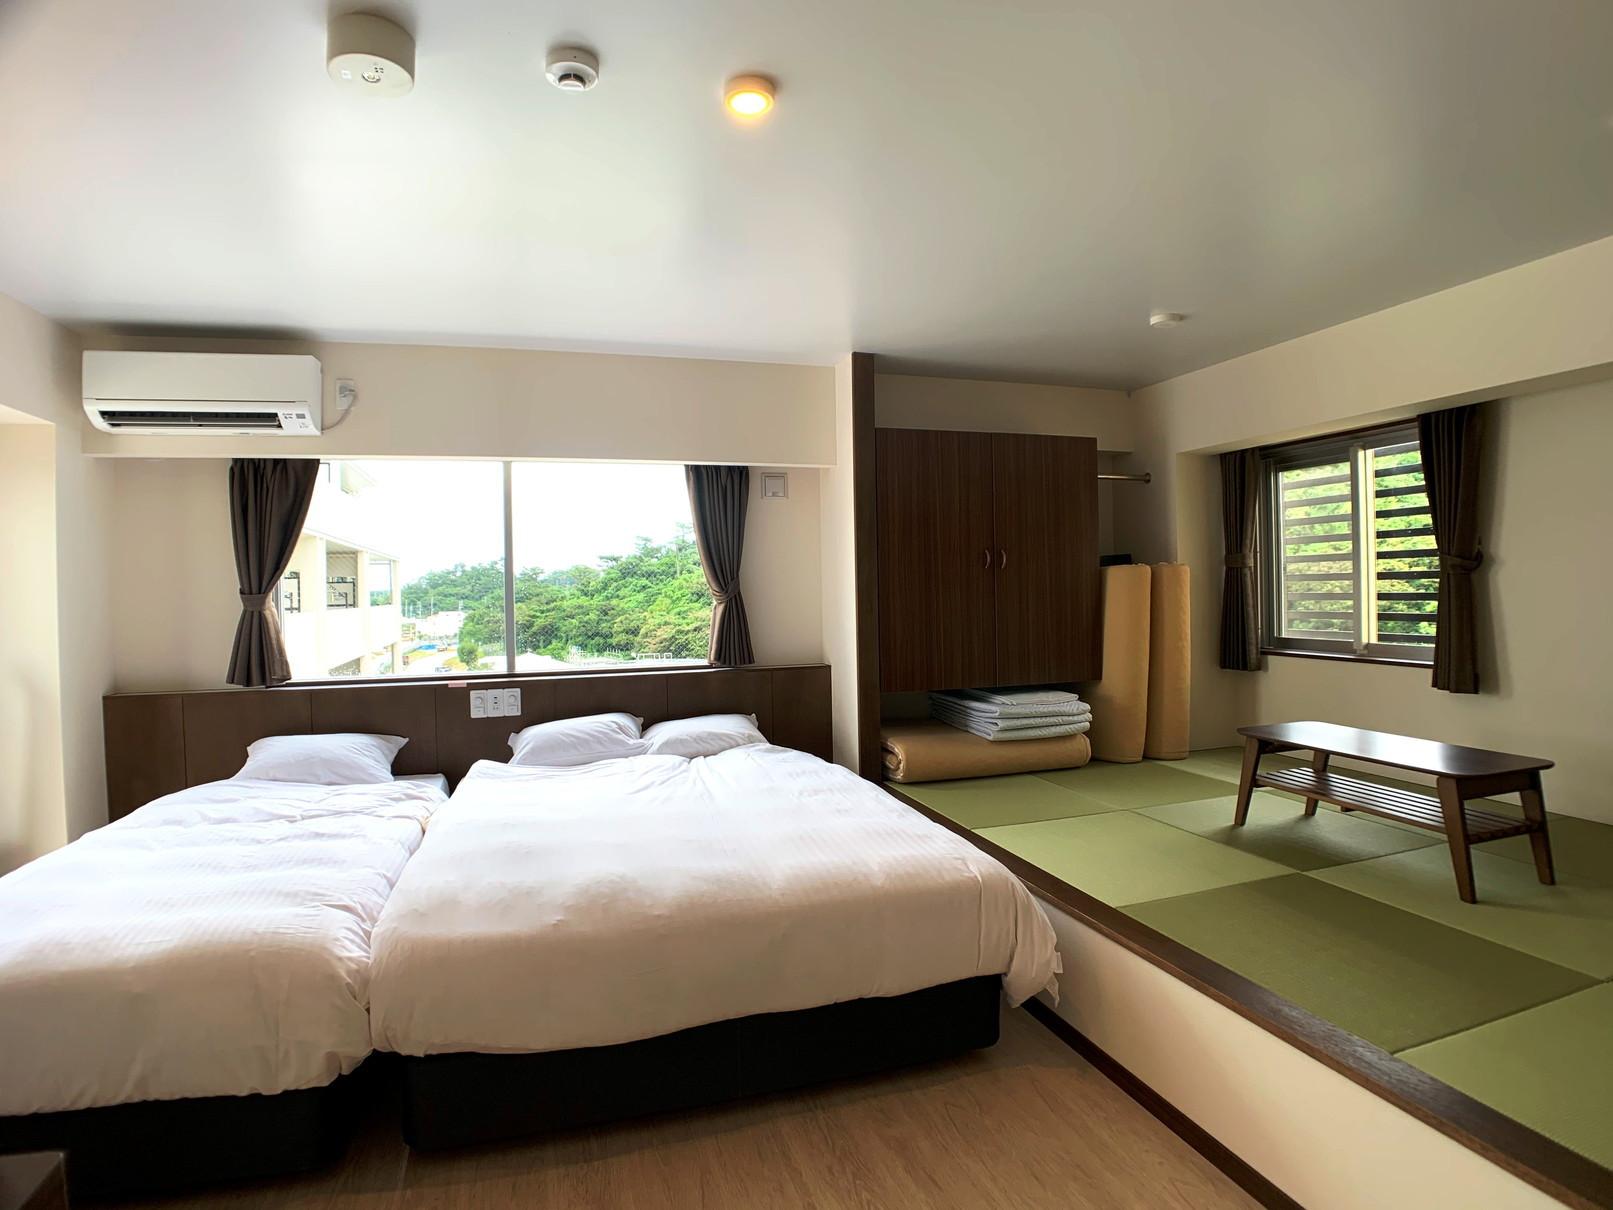 Aqua Resort in Chatan / 【さき楽14】早めの予約が断然お得!《素泊り》 ★キッチン・家電付き★